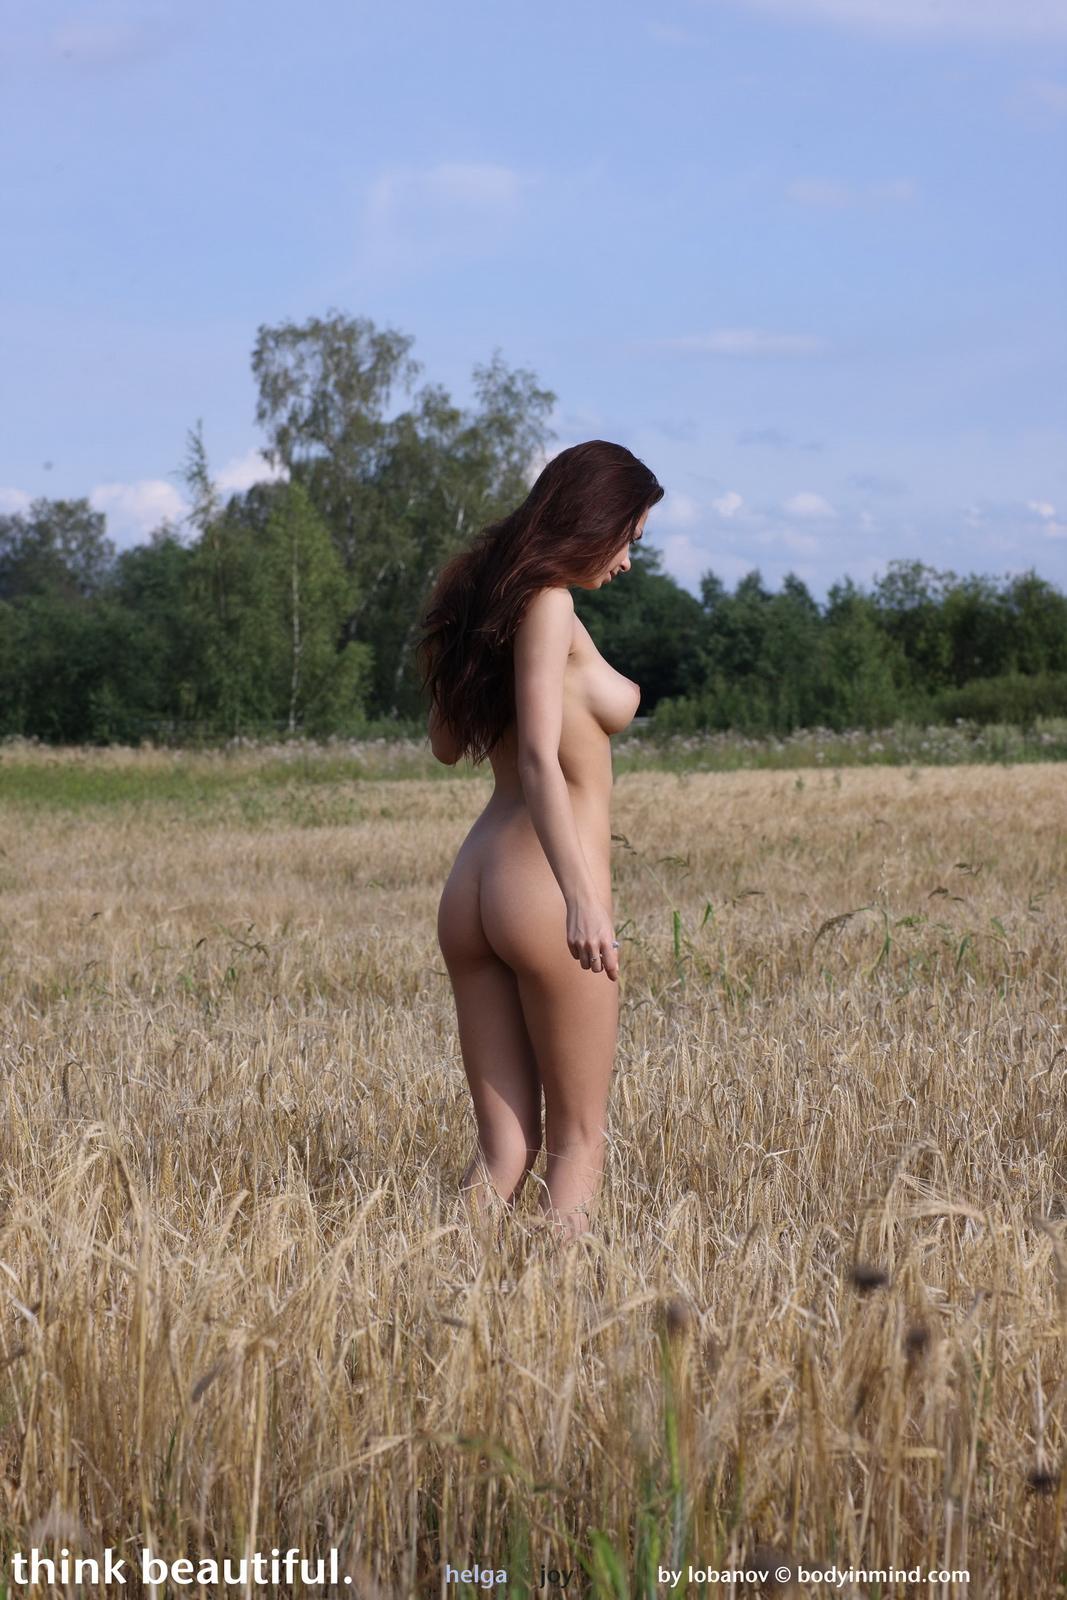 helga-boobs-nude-field-grain-bodyinmind-25